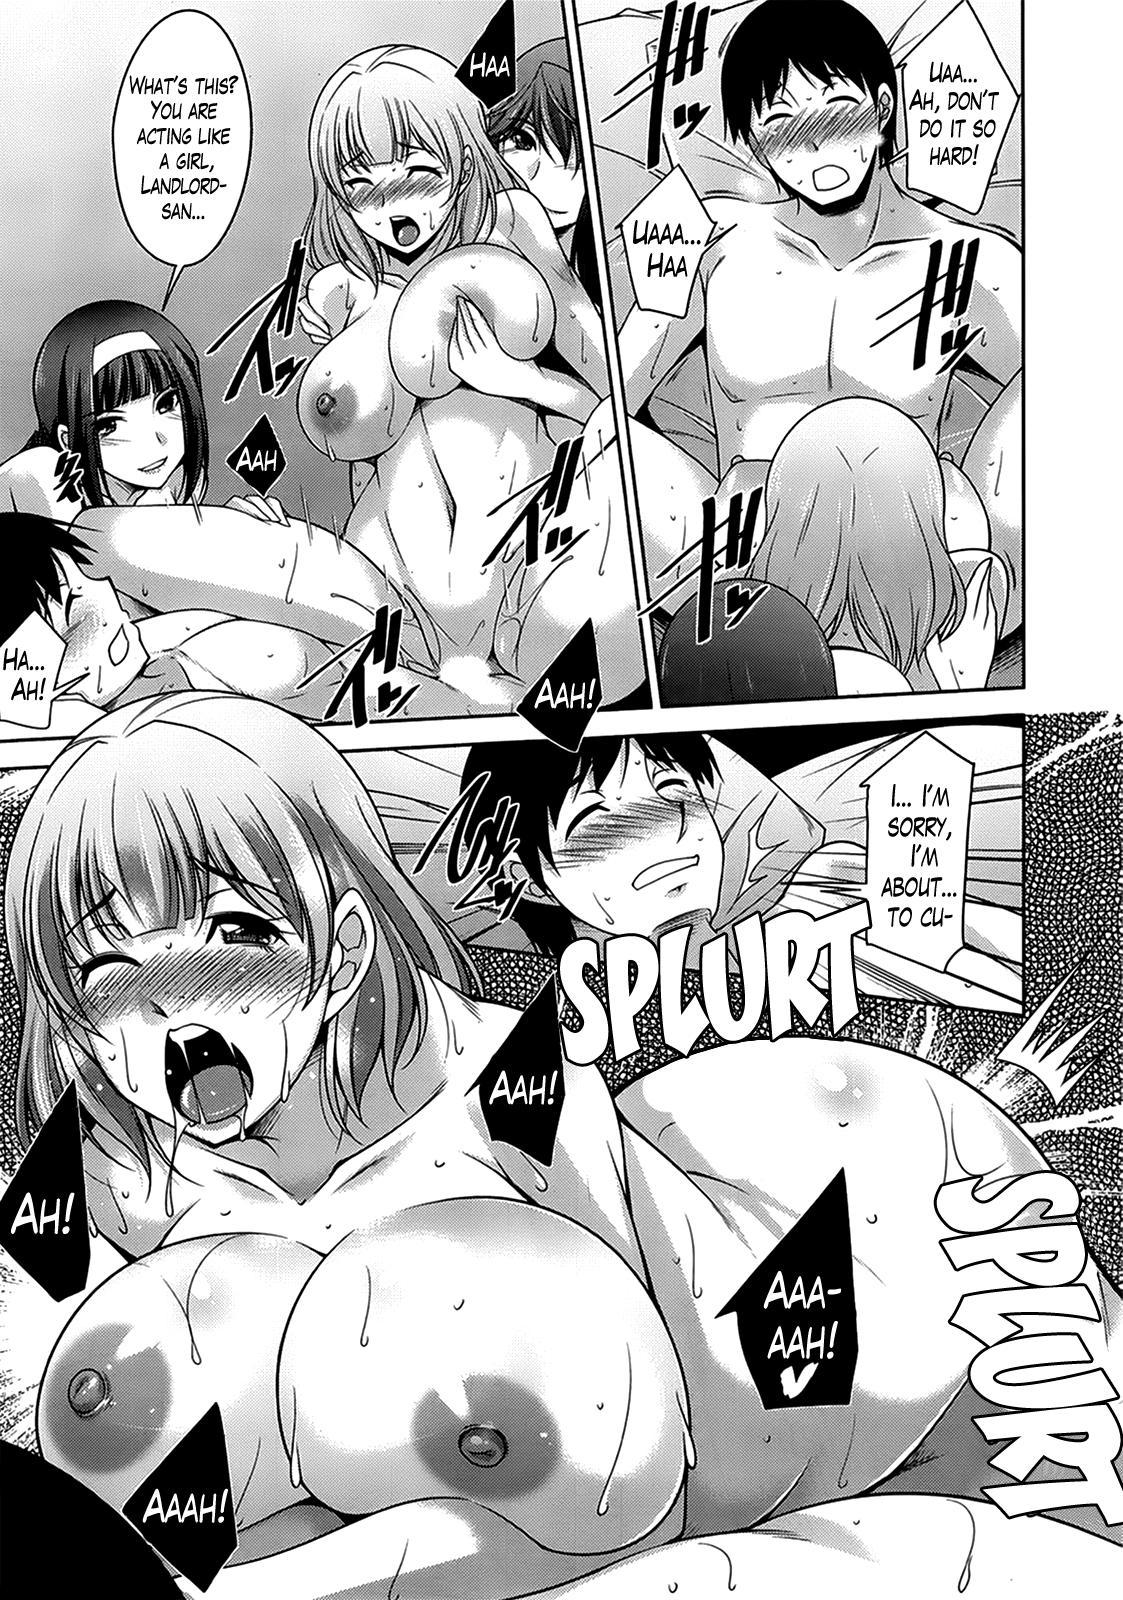 [Zen9] Taikutsu na Gogo no Sugoshikata Ch. 1-5   A Way to Spend a Boring Afternoon Ch. 1-5 (Action Pizazz DX 2013-12) [English](hentai2read.com)[Lazarus H] 90